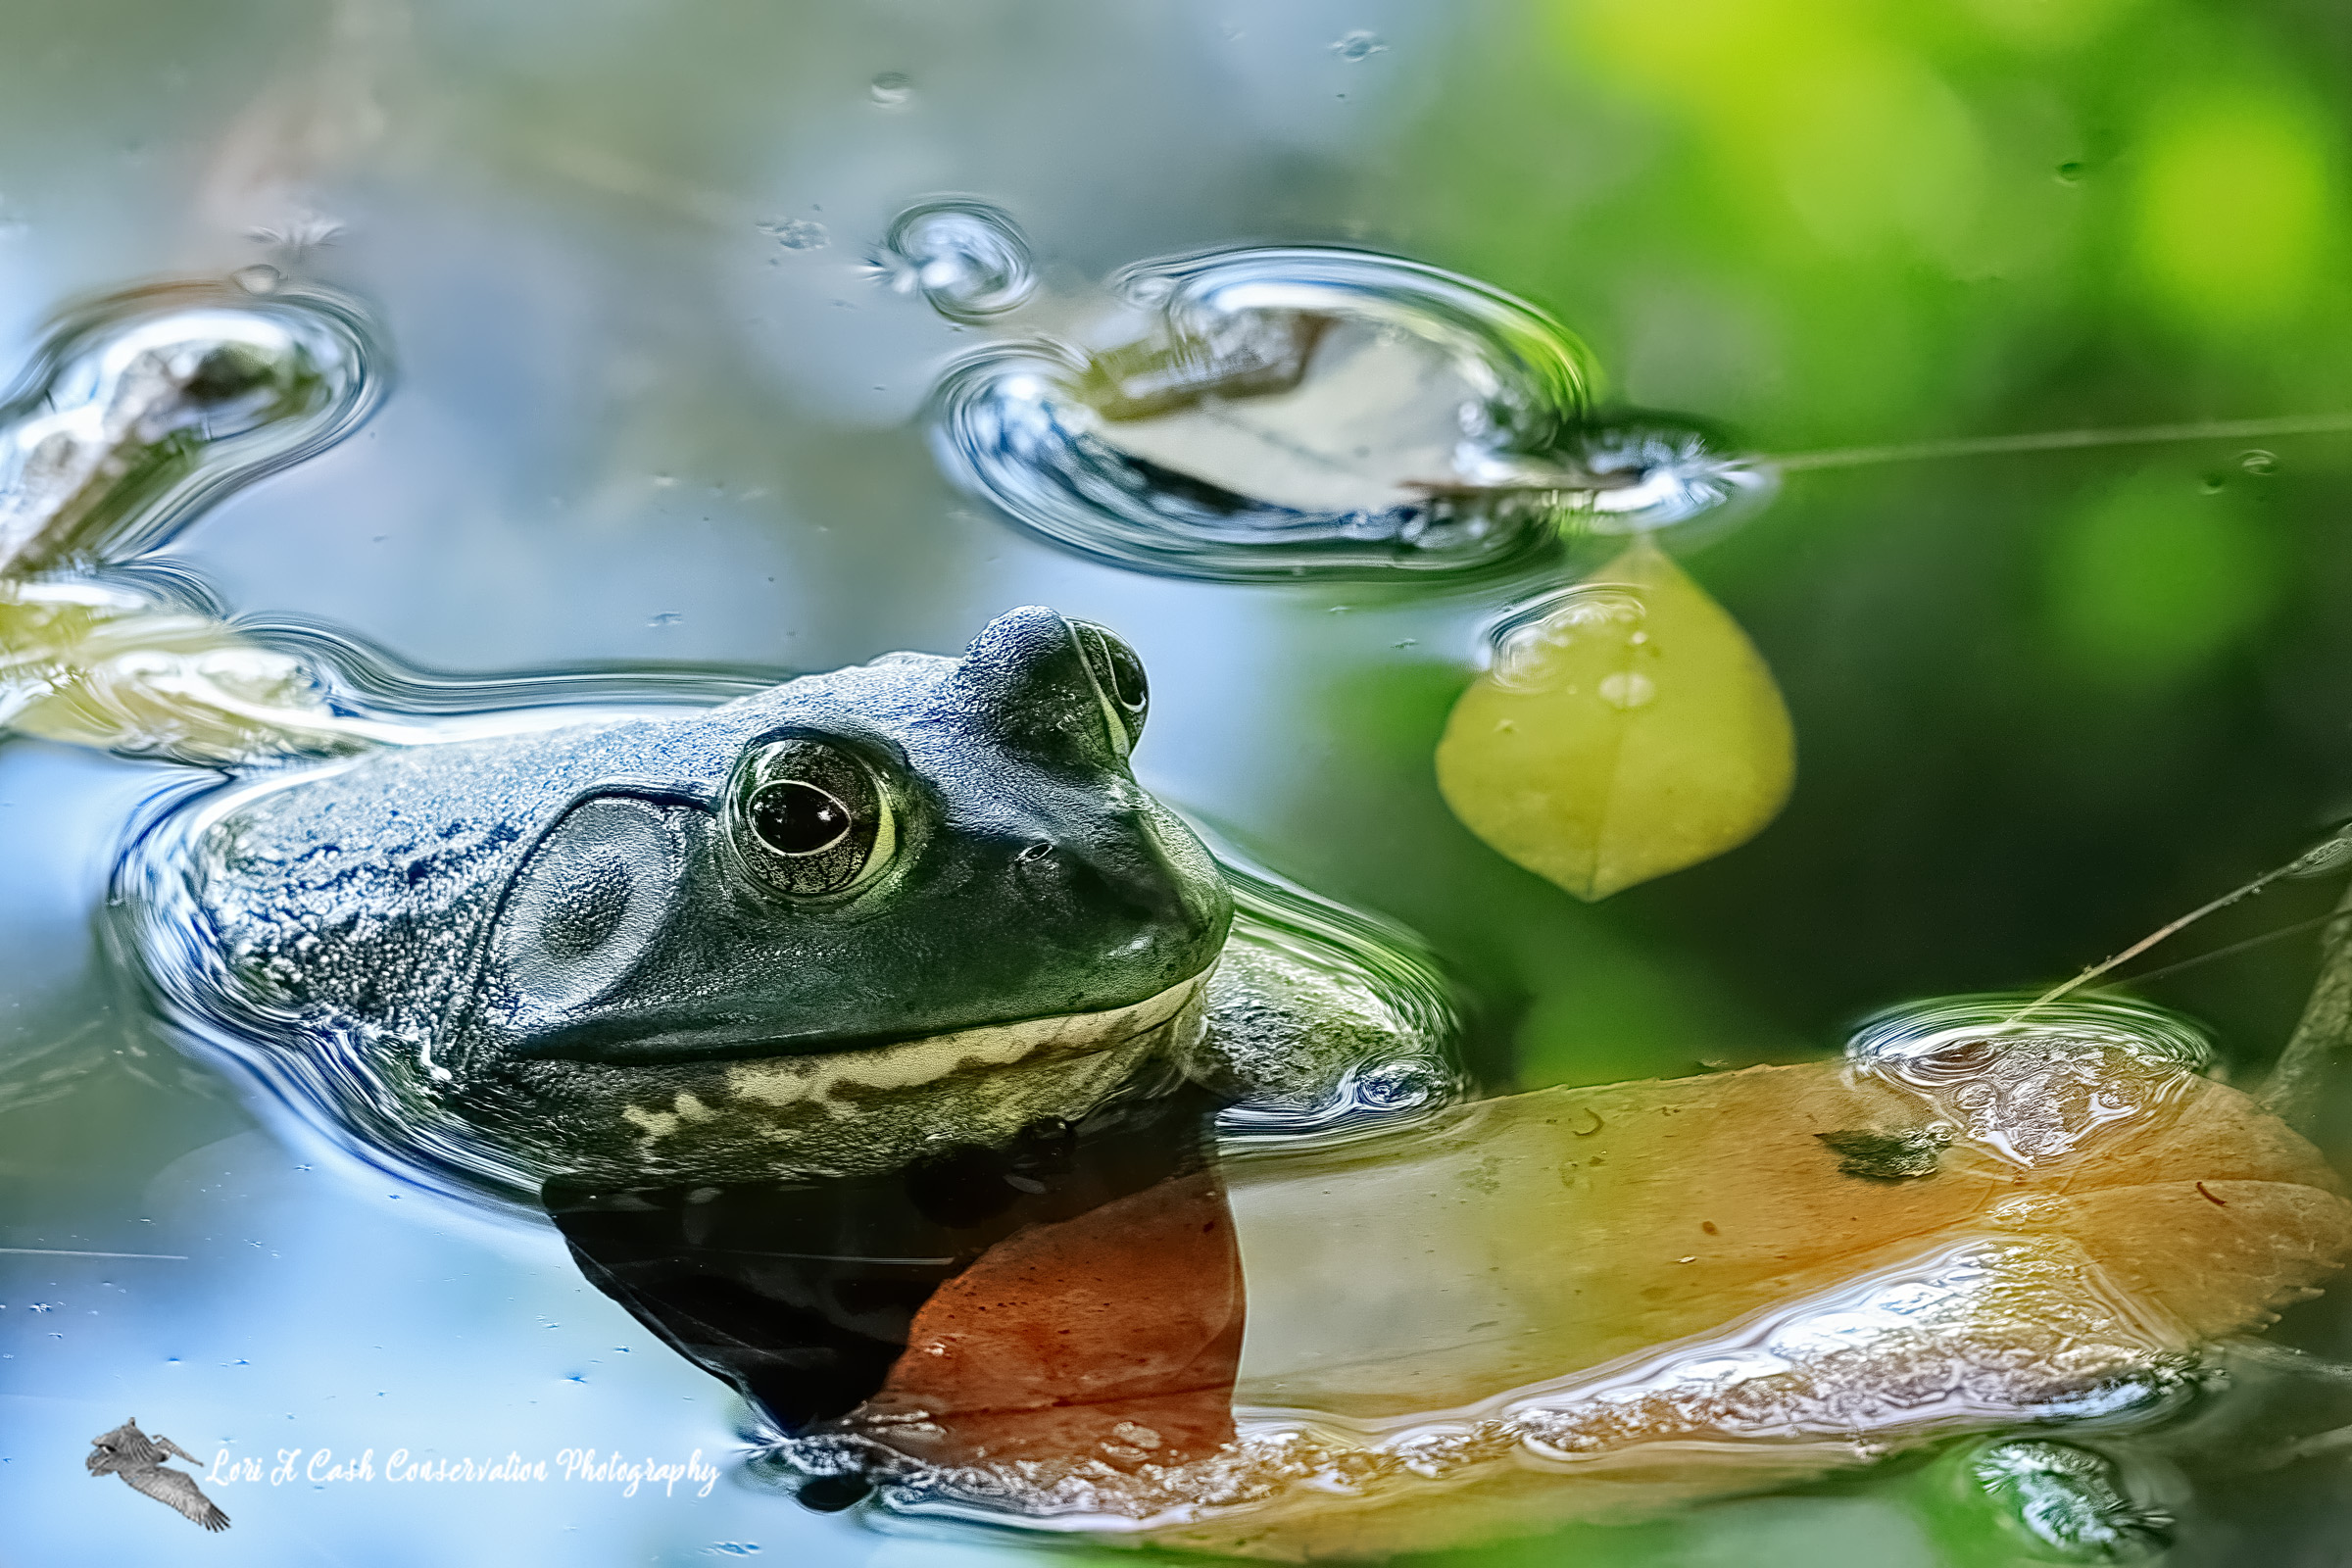 American bullfrog in the pond with leaves at Norfolk Botanical Garden in Norfolk, Virginia.